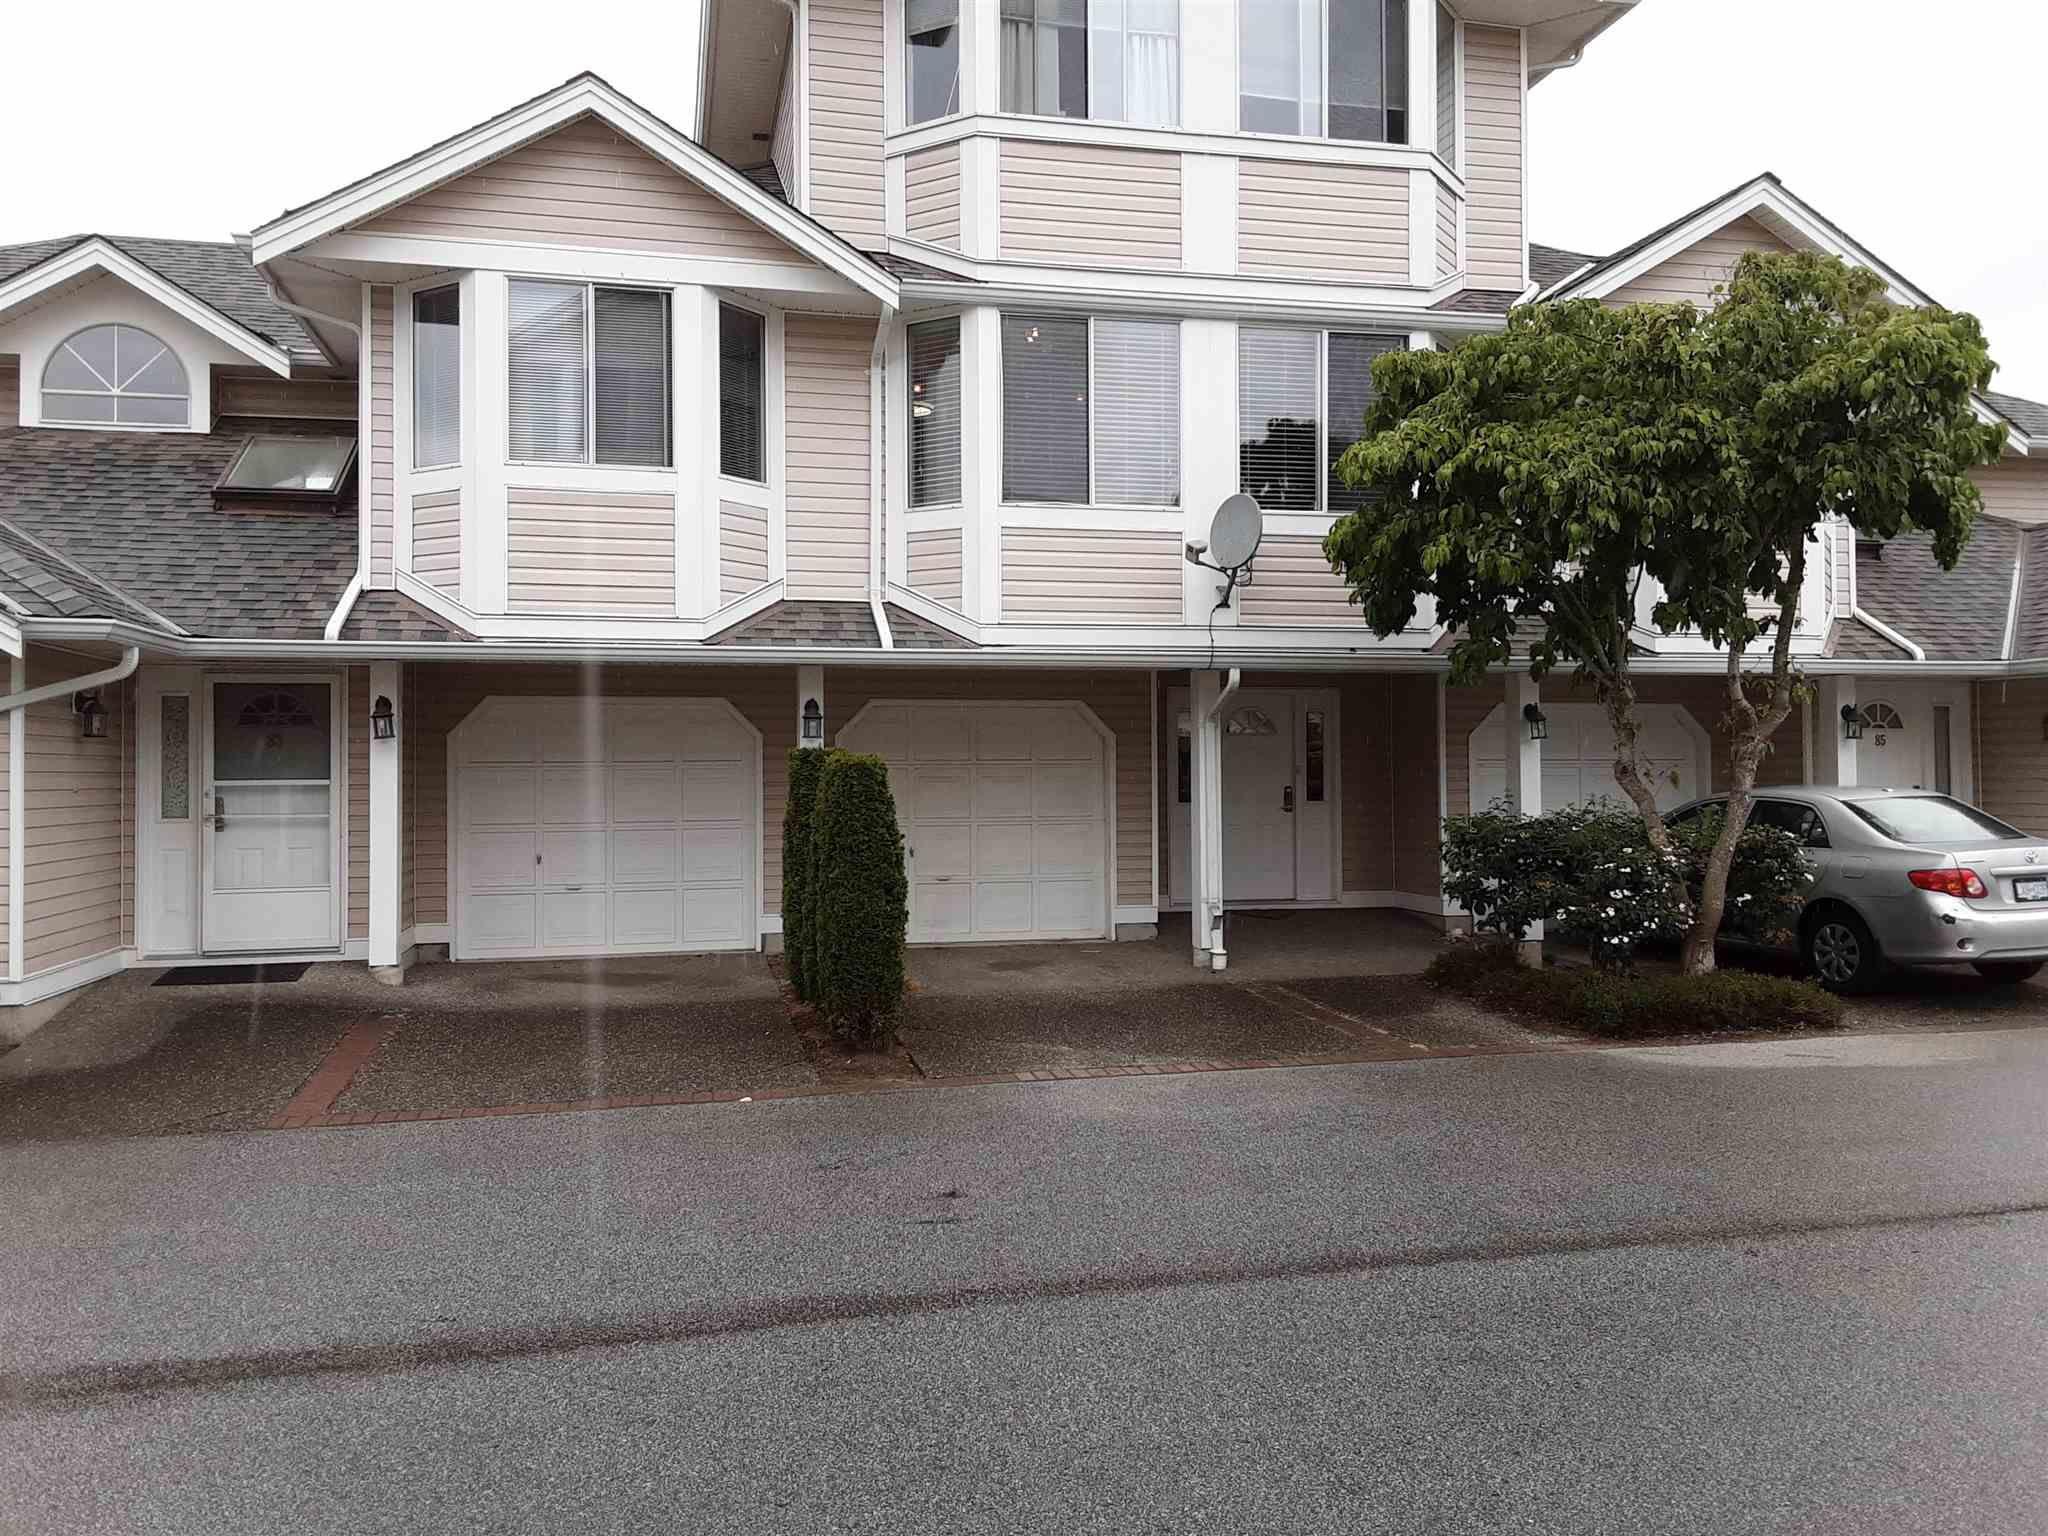 "Main Photo: 84 7955 122 Street in Surrey: West Newton Townhouse for sale in ""Scottsdale Village"" : MLS®# R2602527"